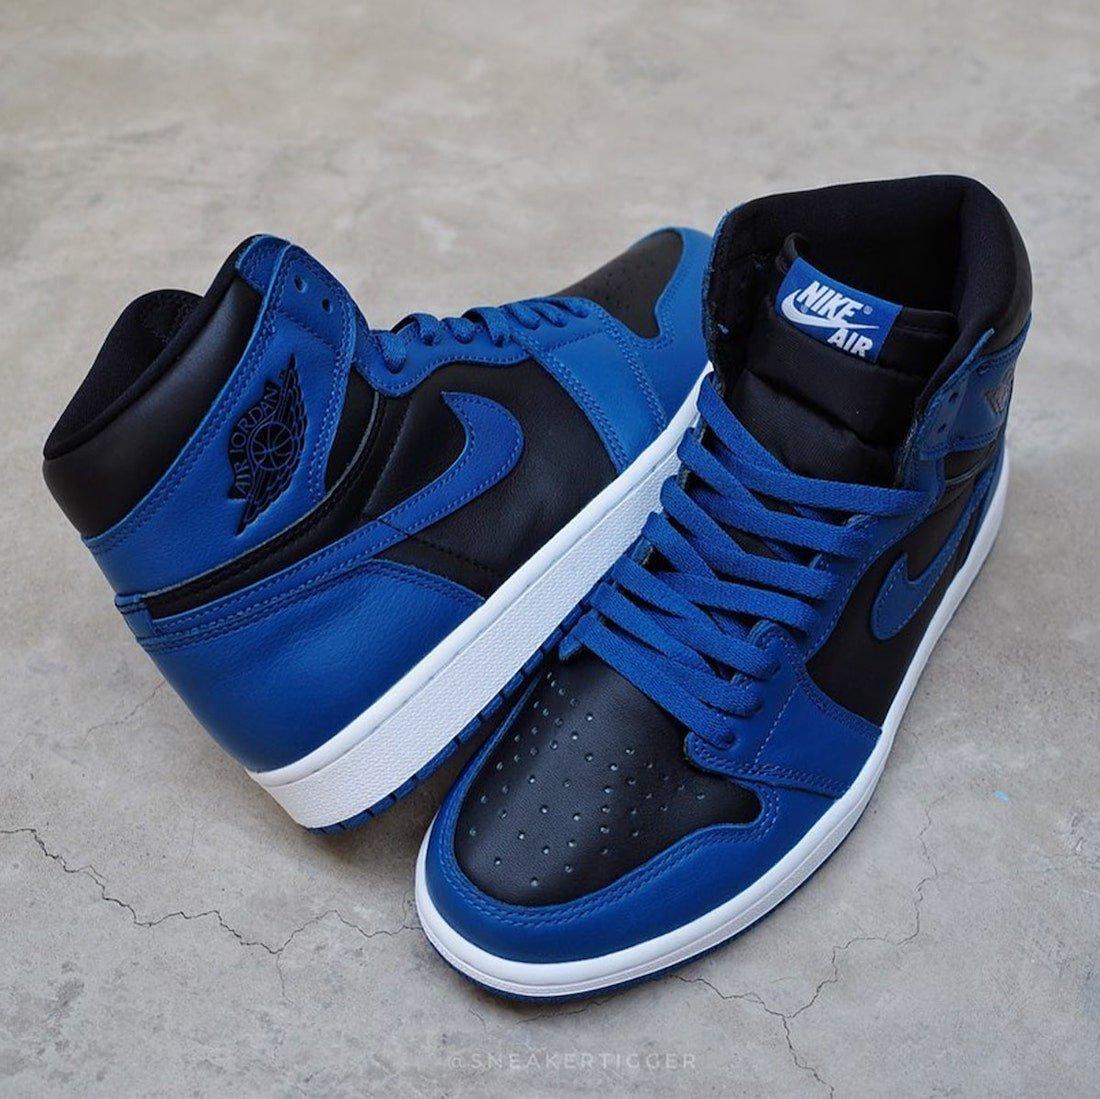 Air Jordan 1 High Dark Marina Blue 555088-404 Release Info